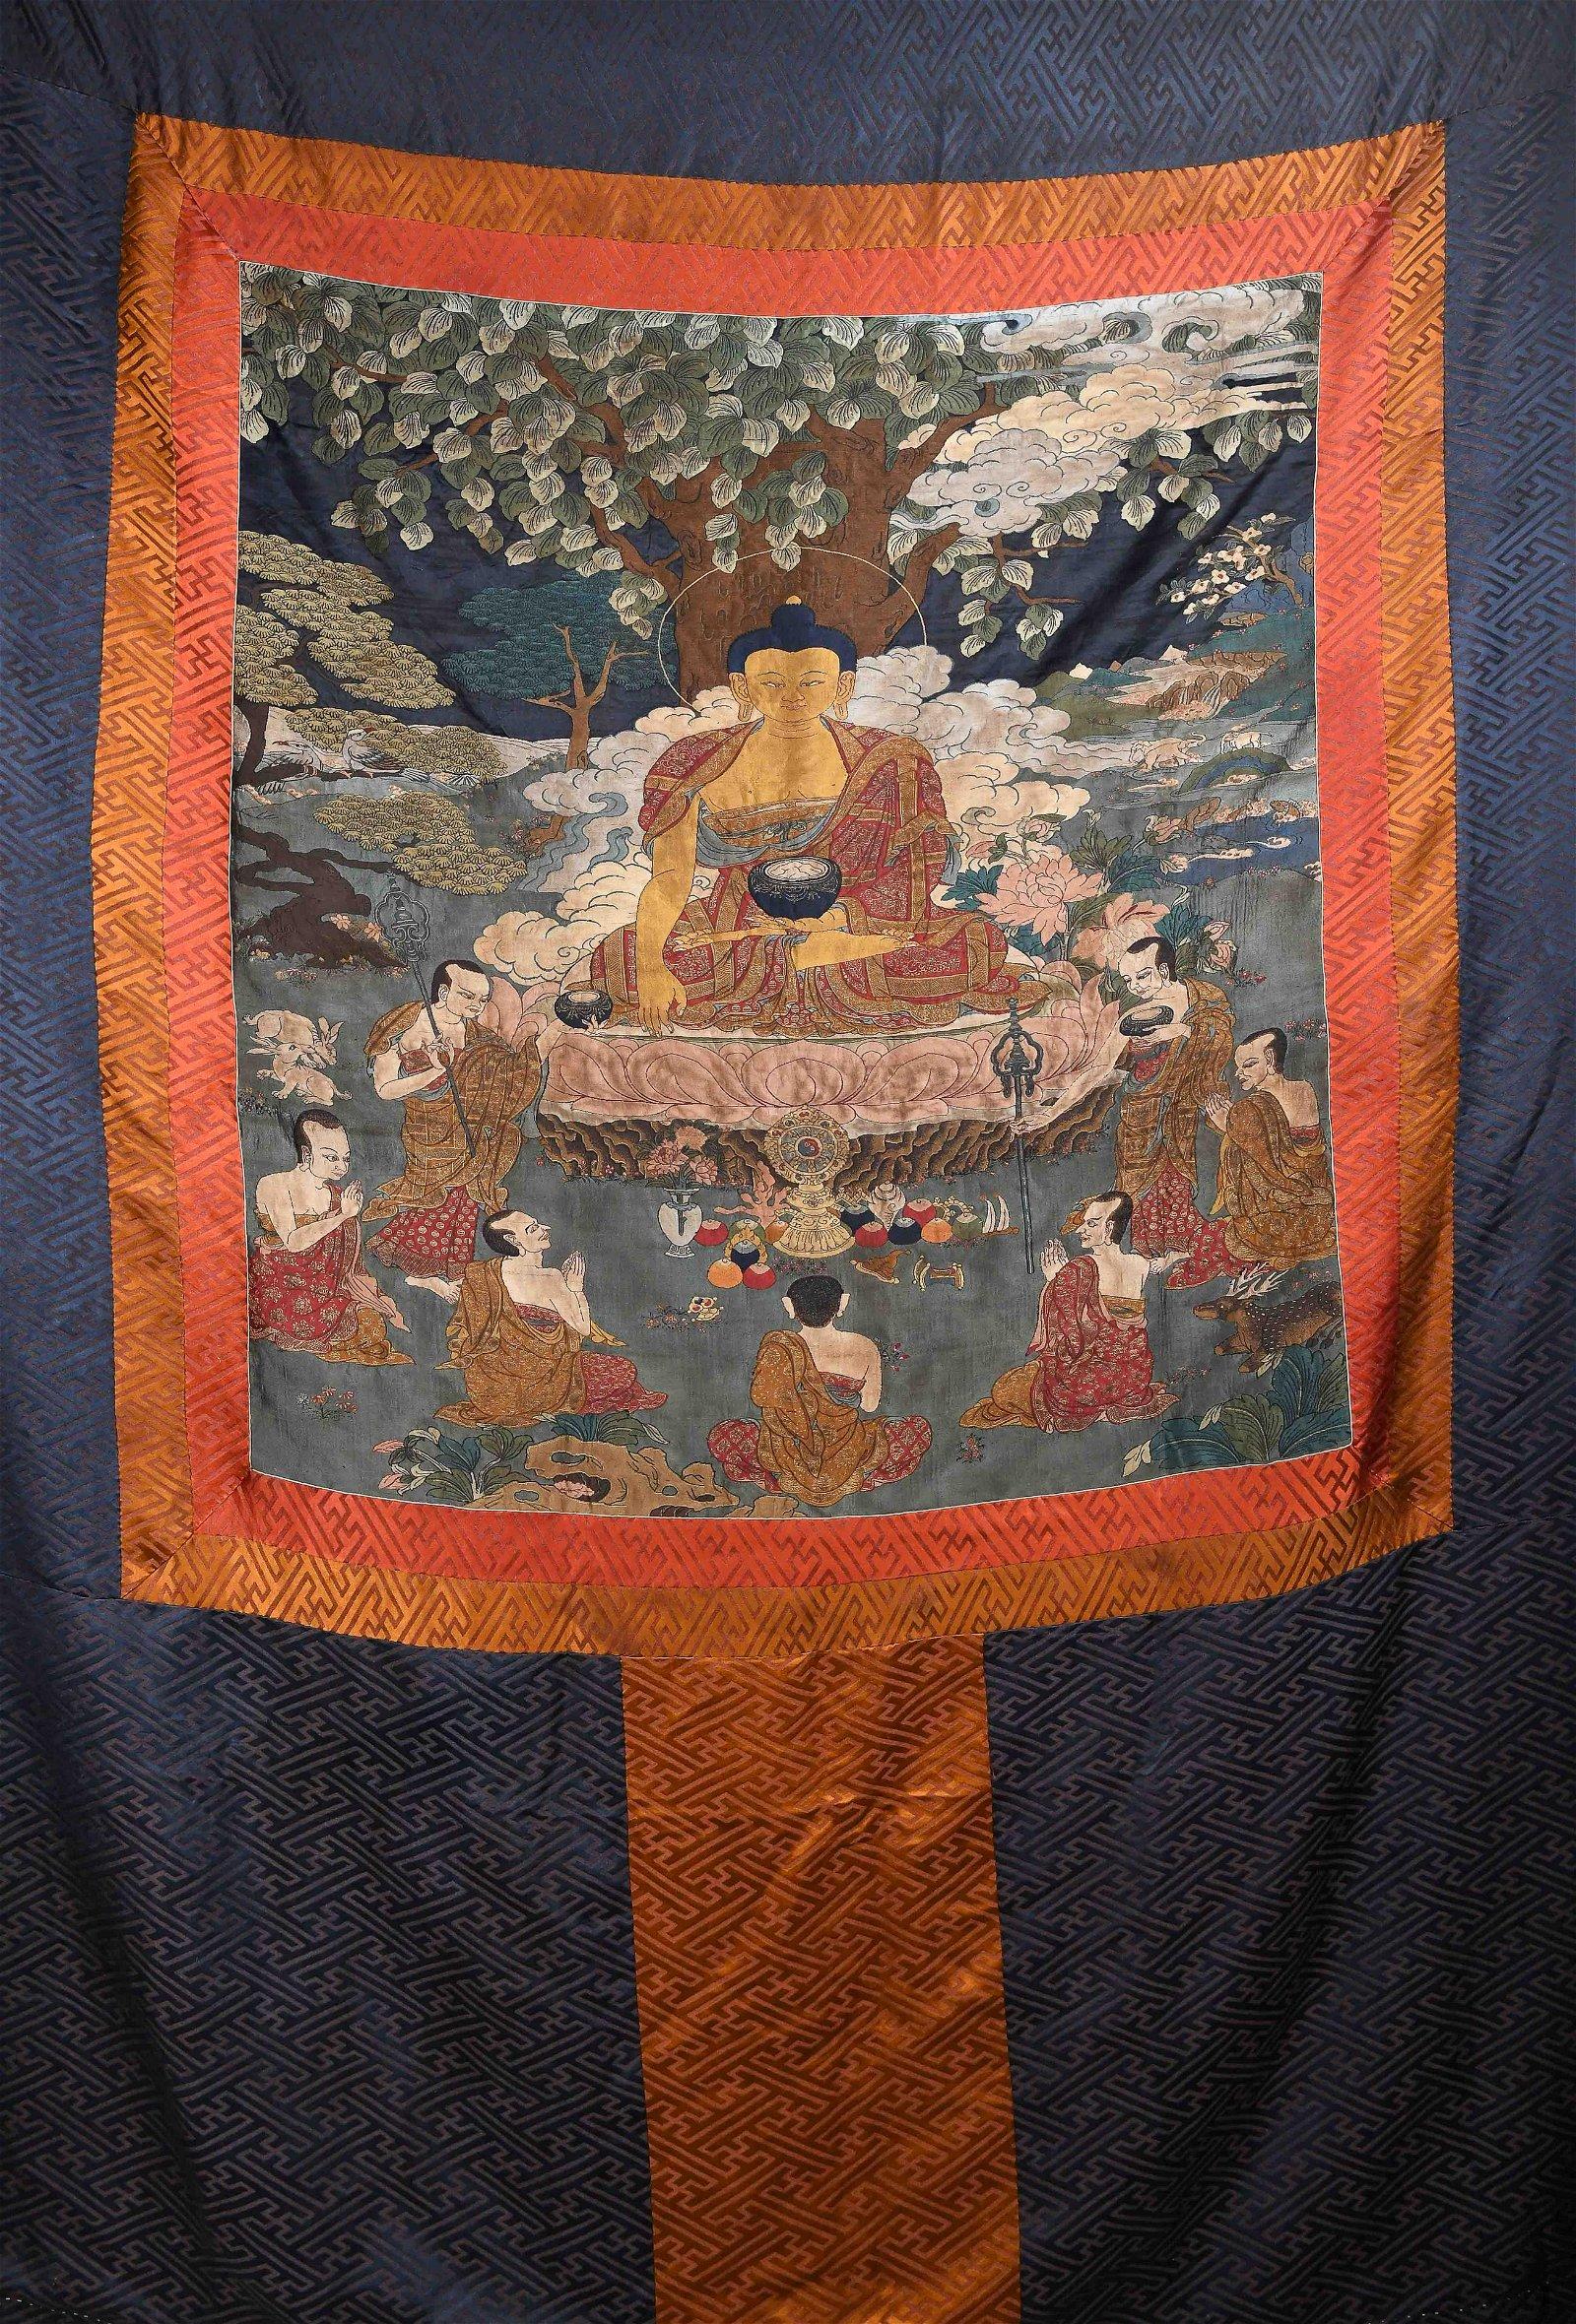 Silk Embroidered Thangka Depicting Shakyamuni W/ Arhats